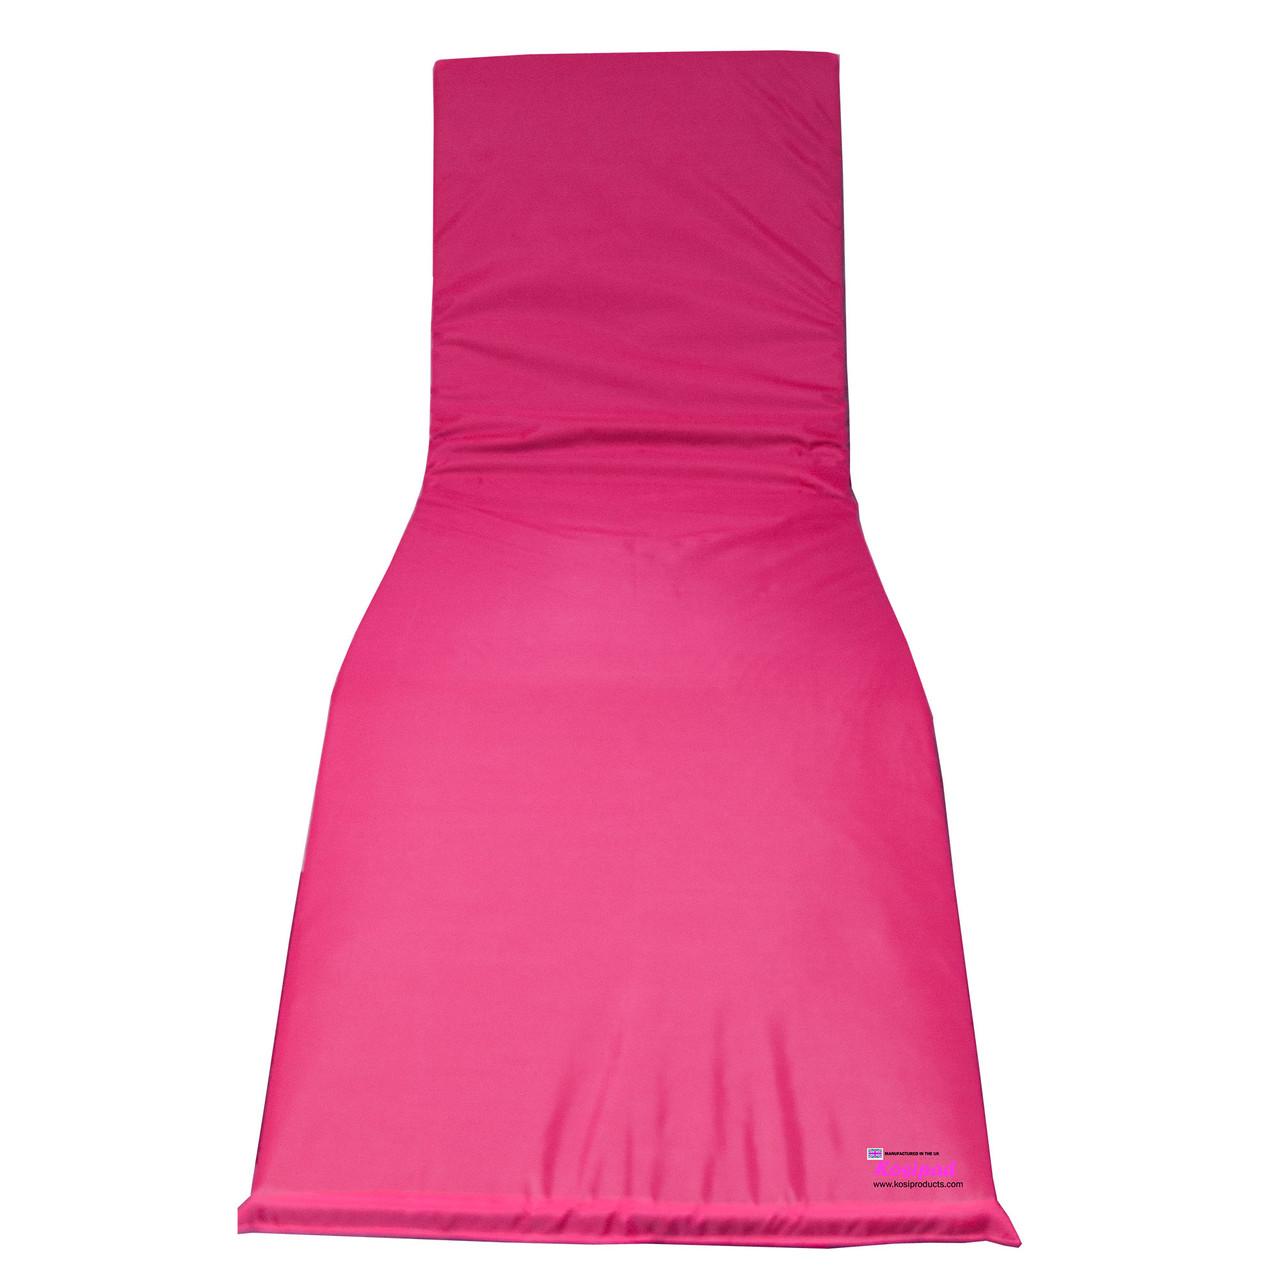 KosiPad Waterproof sun lounger cushion pads Pink